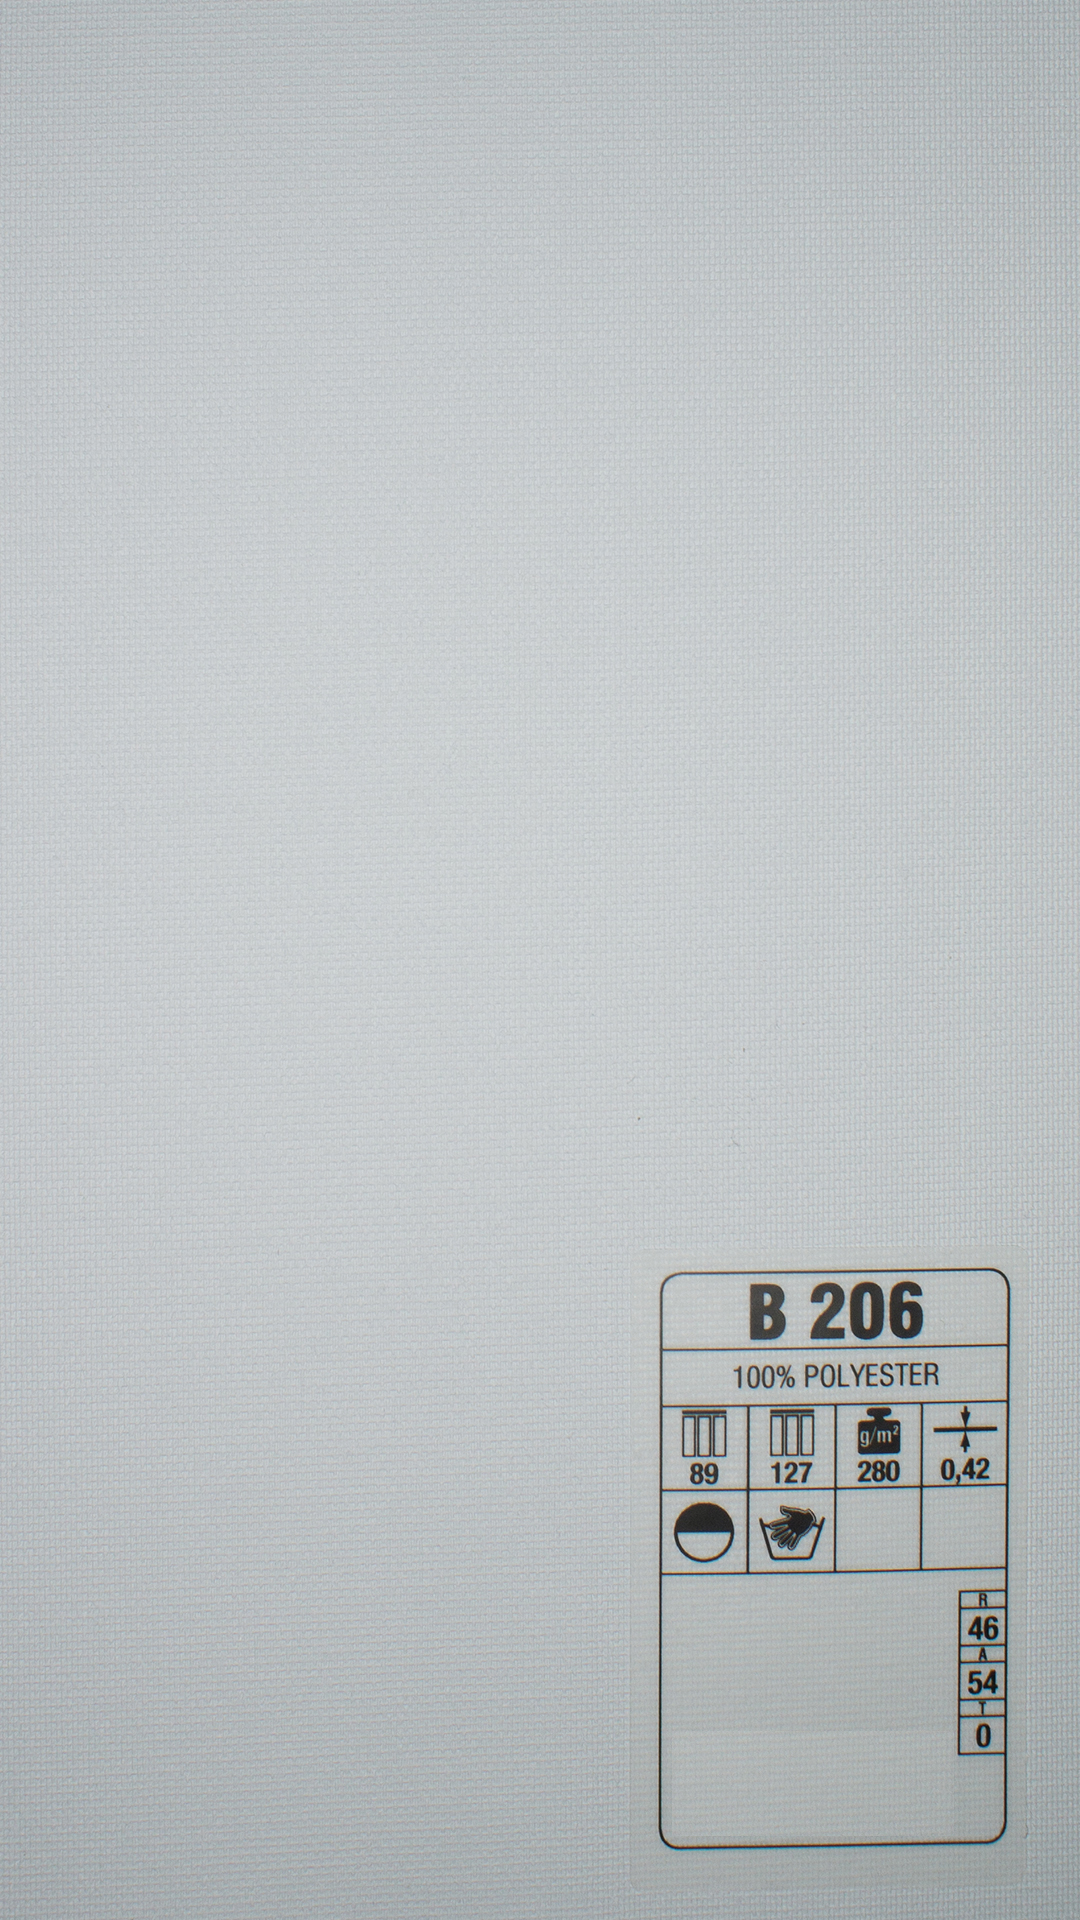 B 206